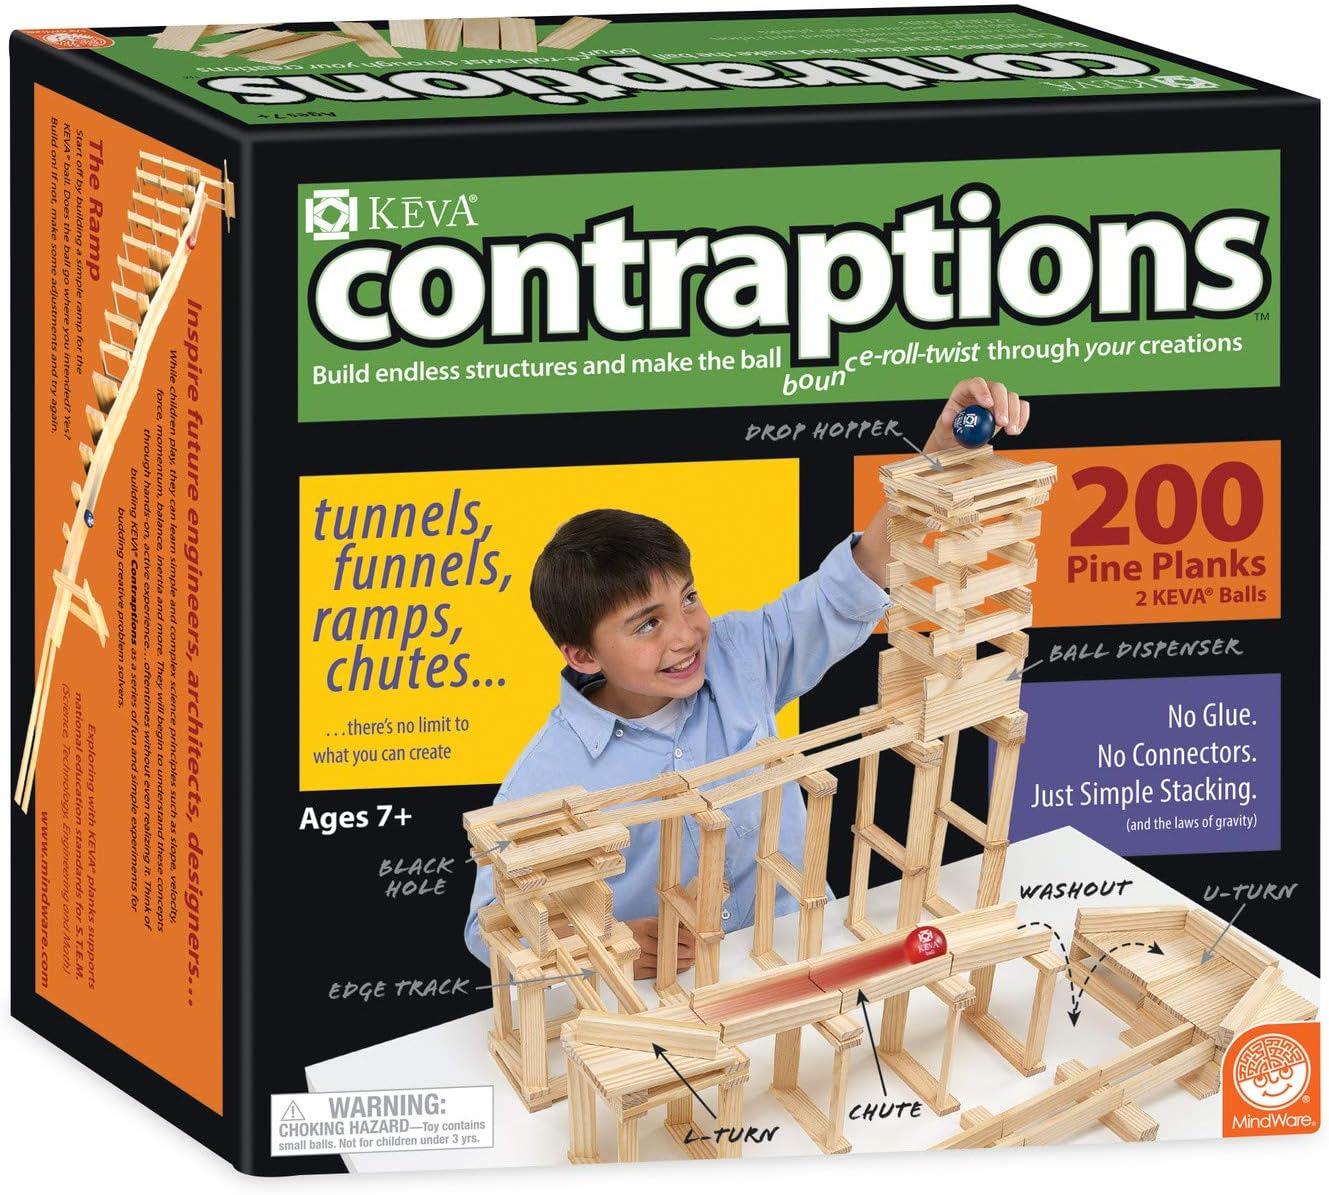 KEVA Contraptions Plank Set